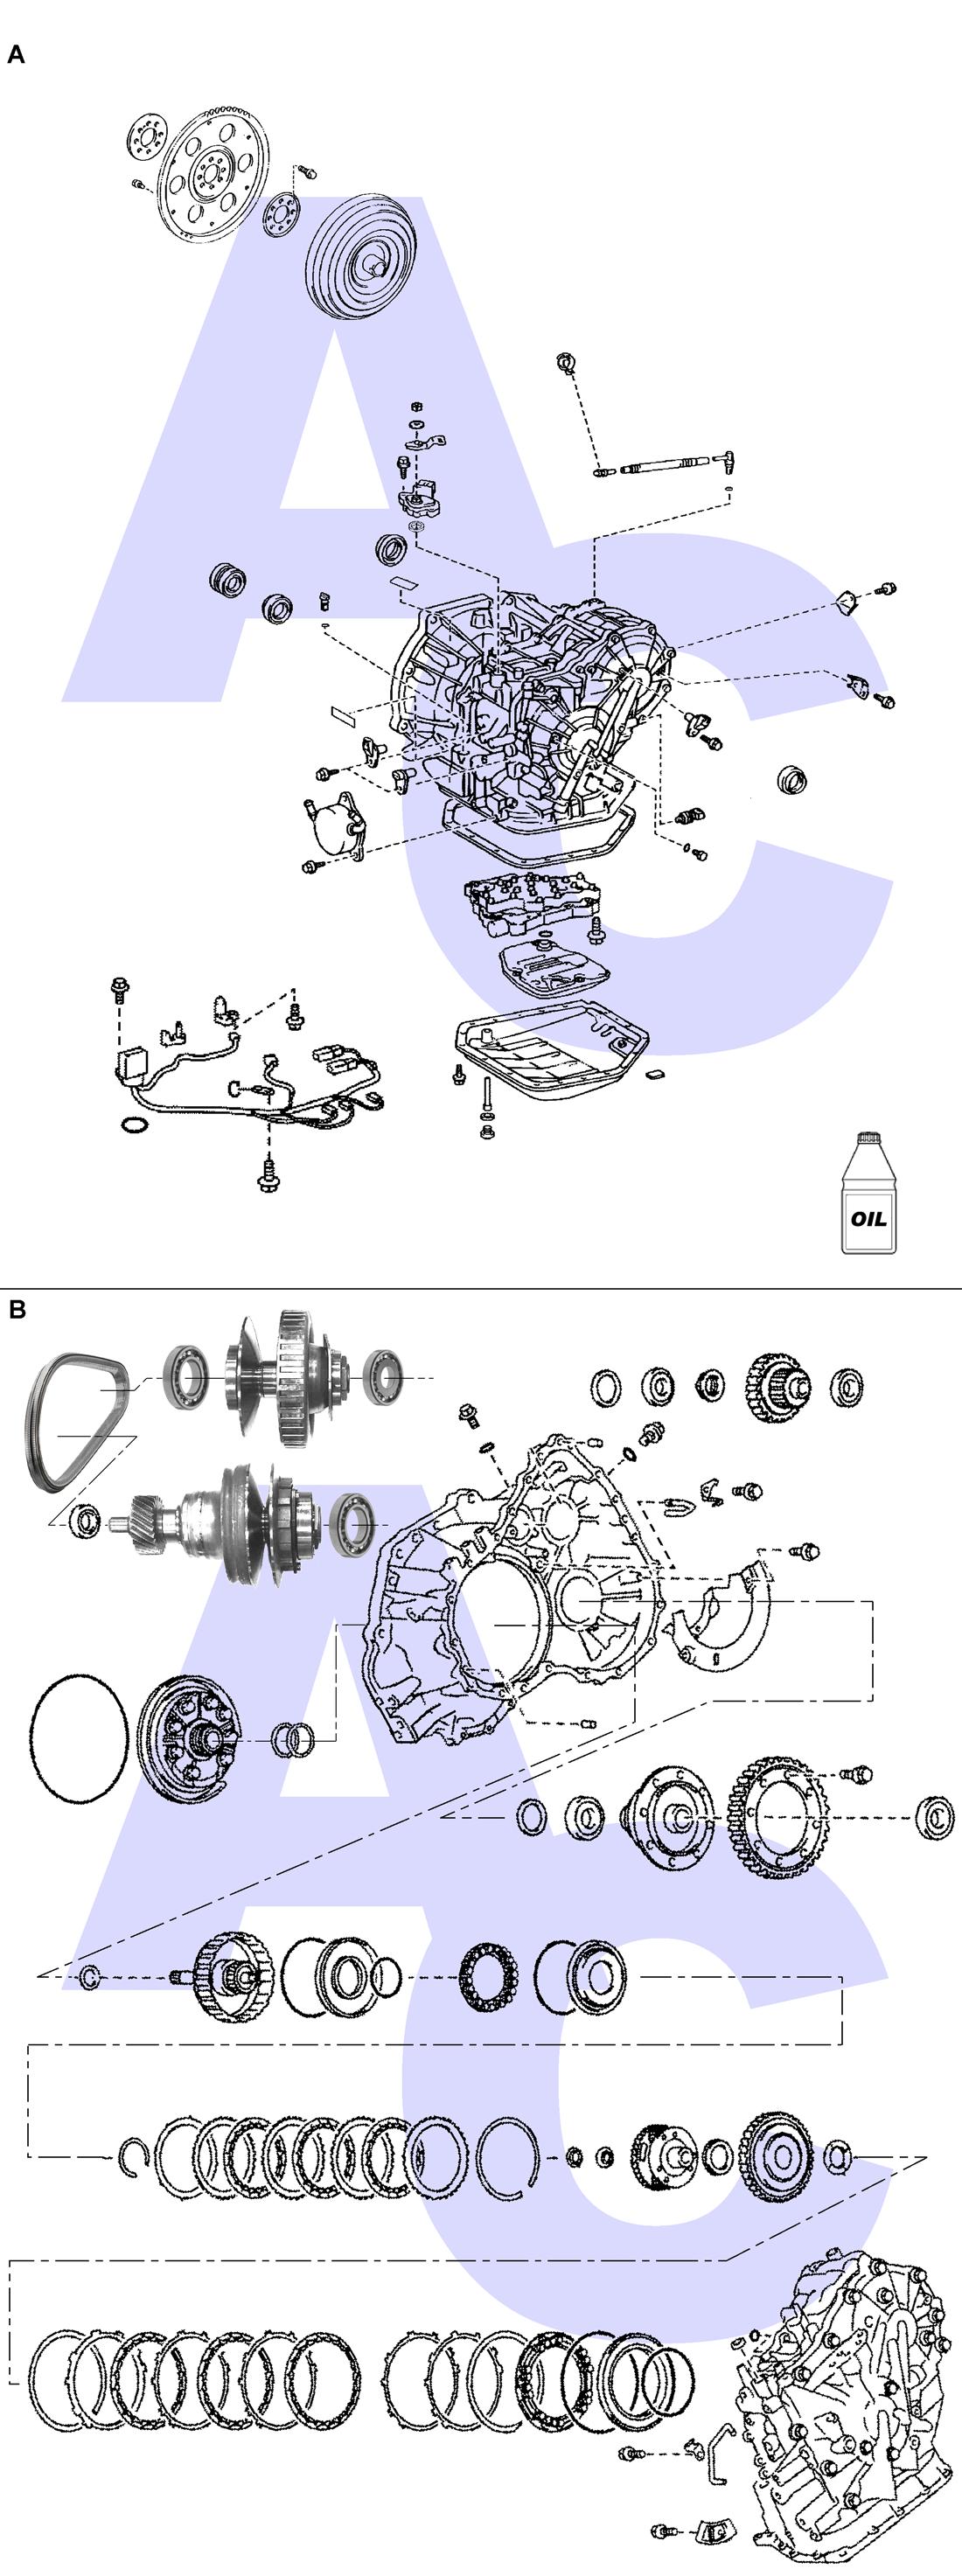 K313 Transmission Parts Catalogue - Automatic Choice